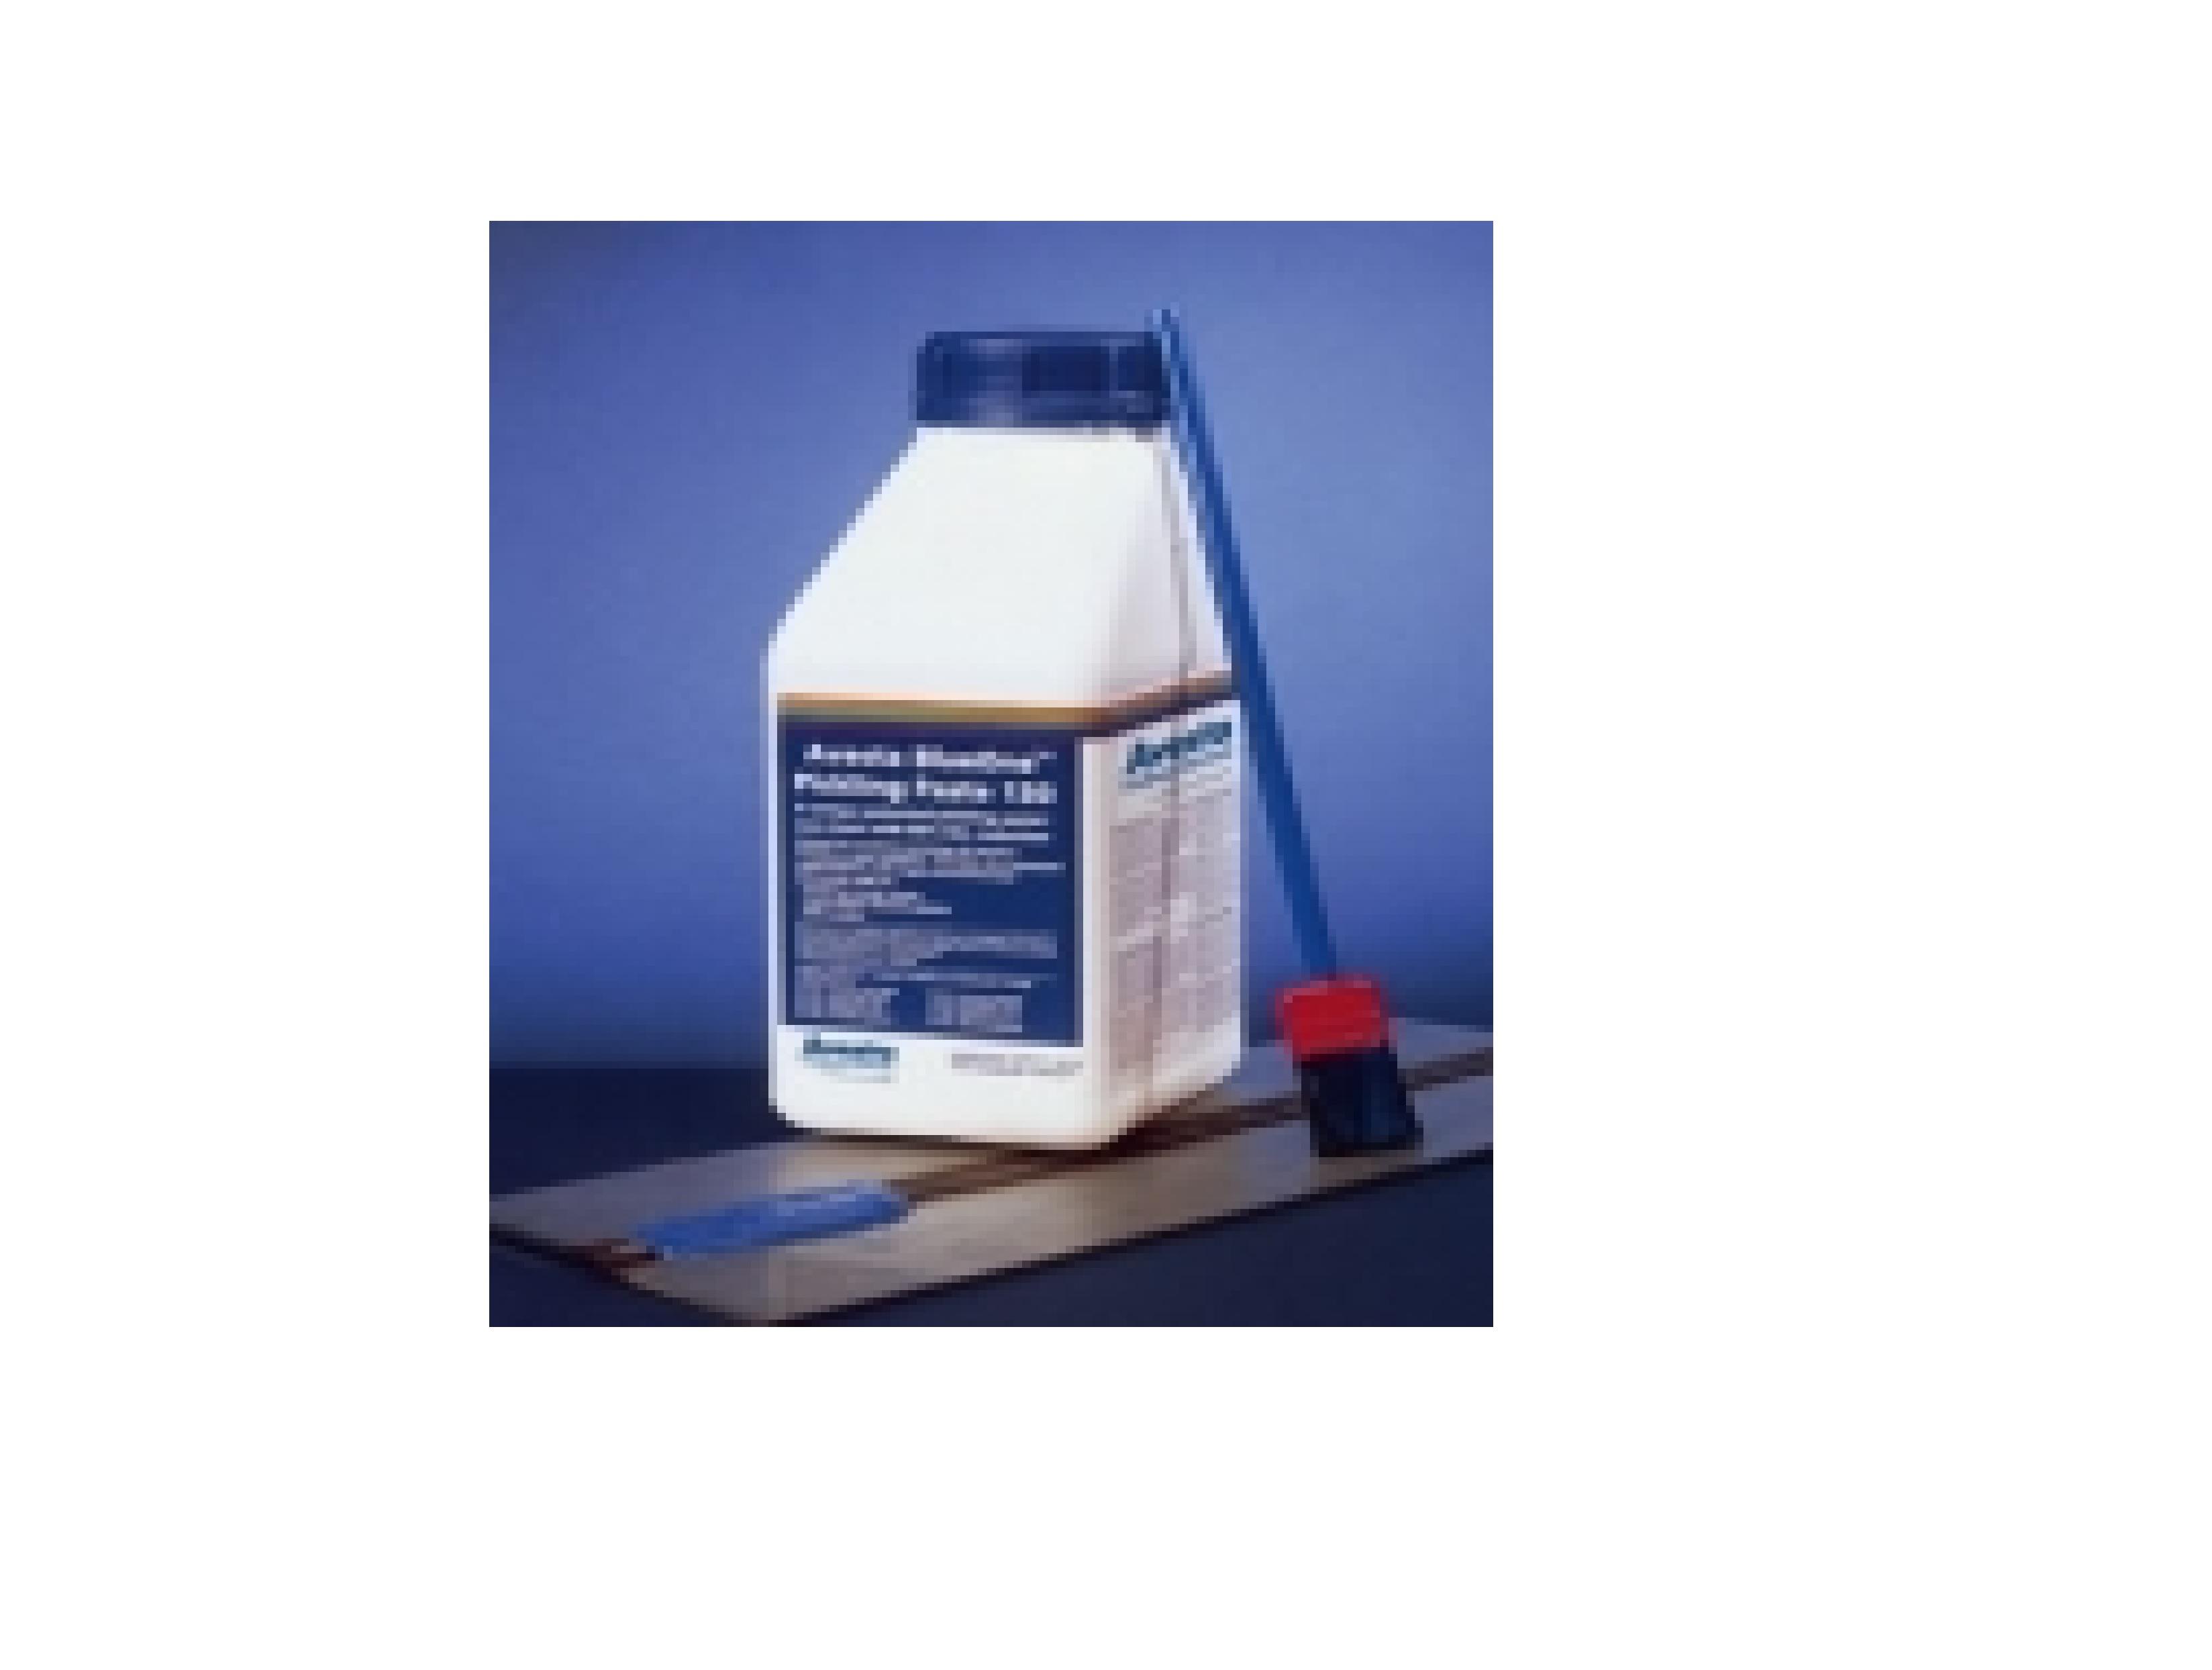 Травильная паста для нержавеющей стали Avesta BlueOne 130